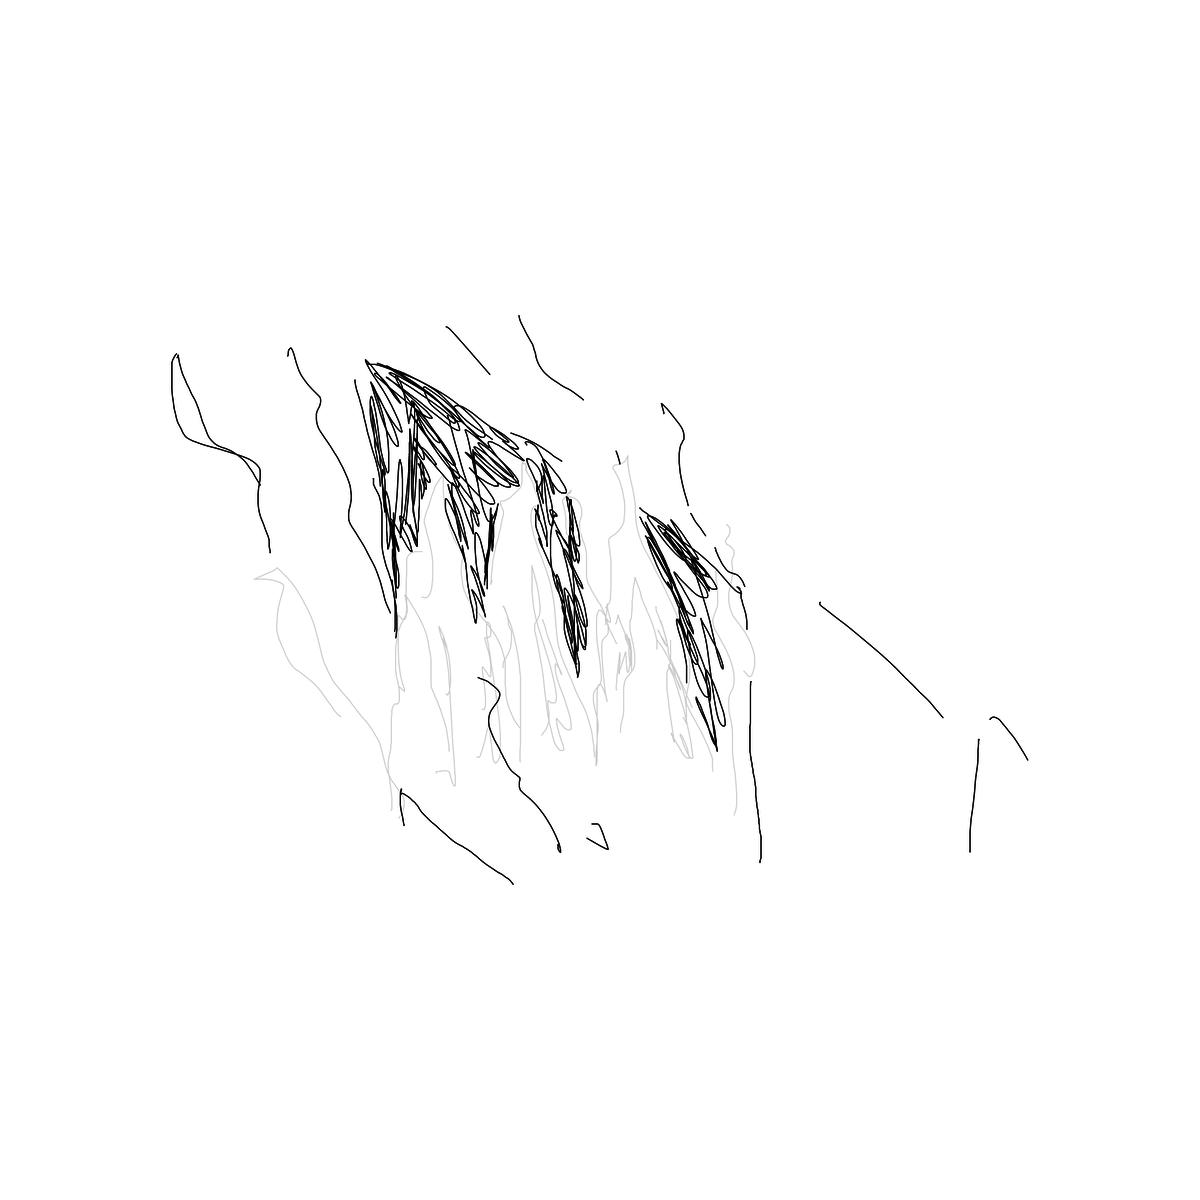 BAAAM drawing#17480 lat:50.0999488830566400lng: 8.7723321914672850